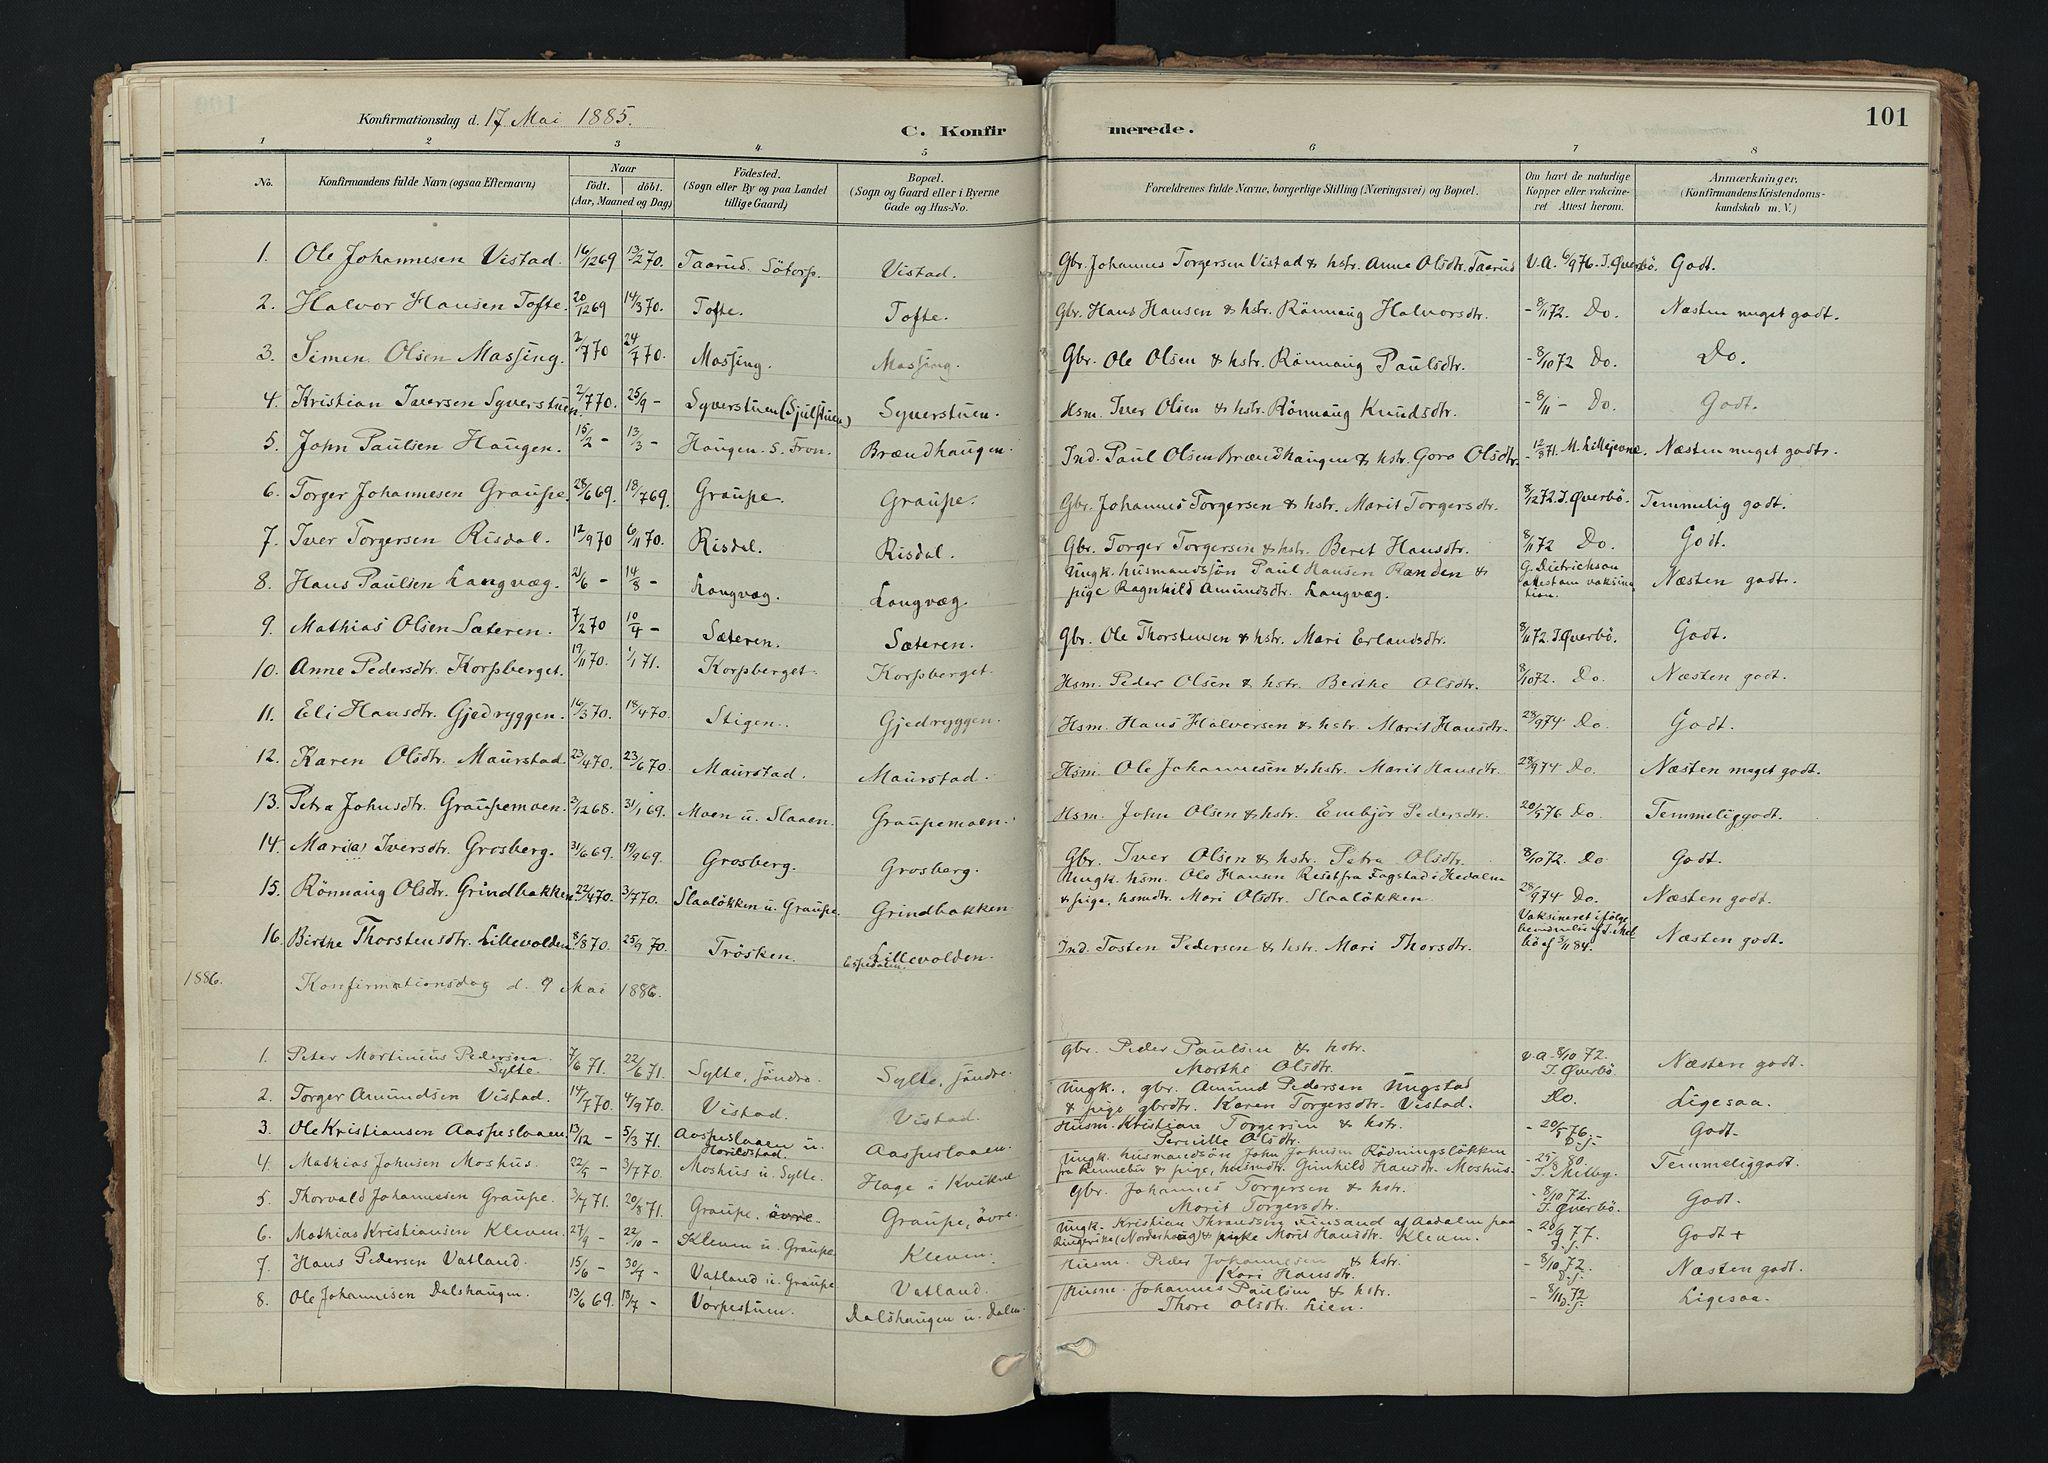 SAH, Nord-Fron prestekontor, Ministerialbok nr. 5, 1884-1914, s. 101